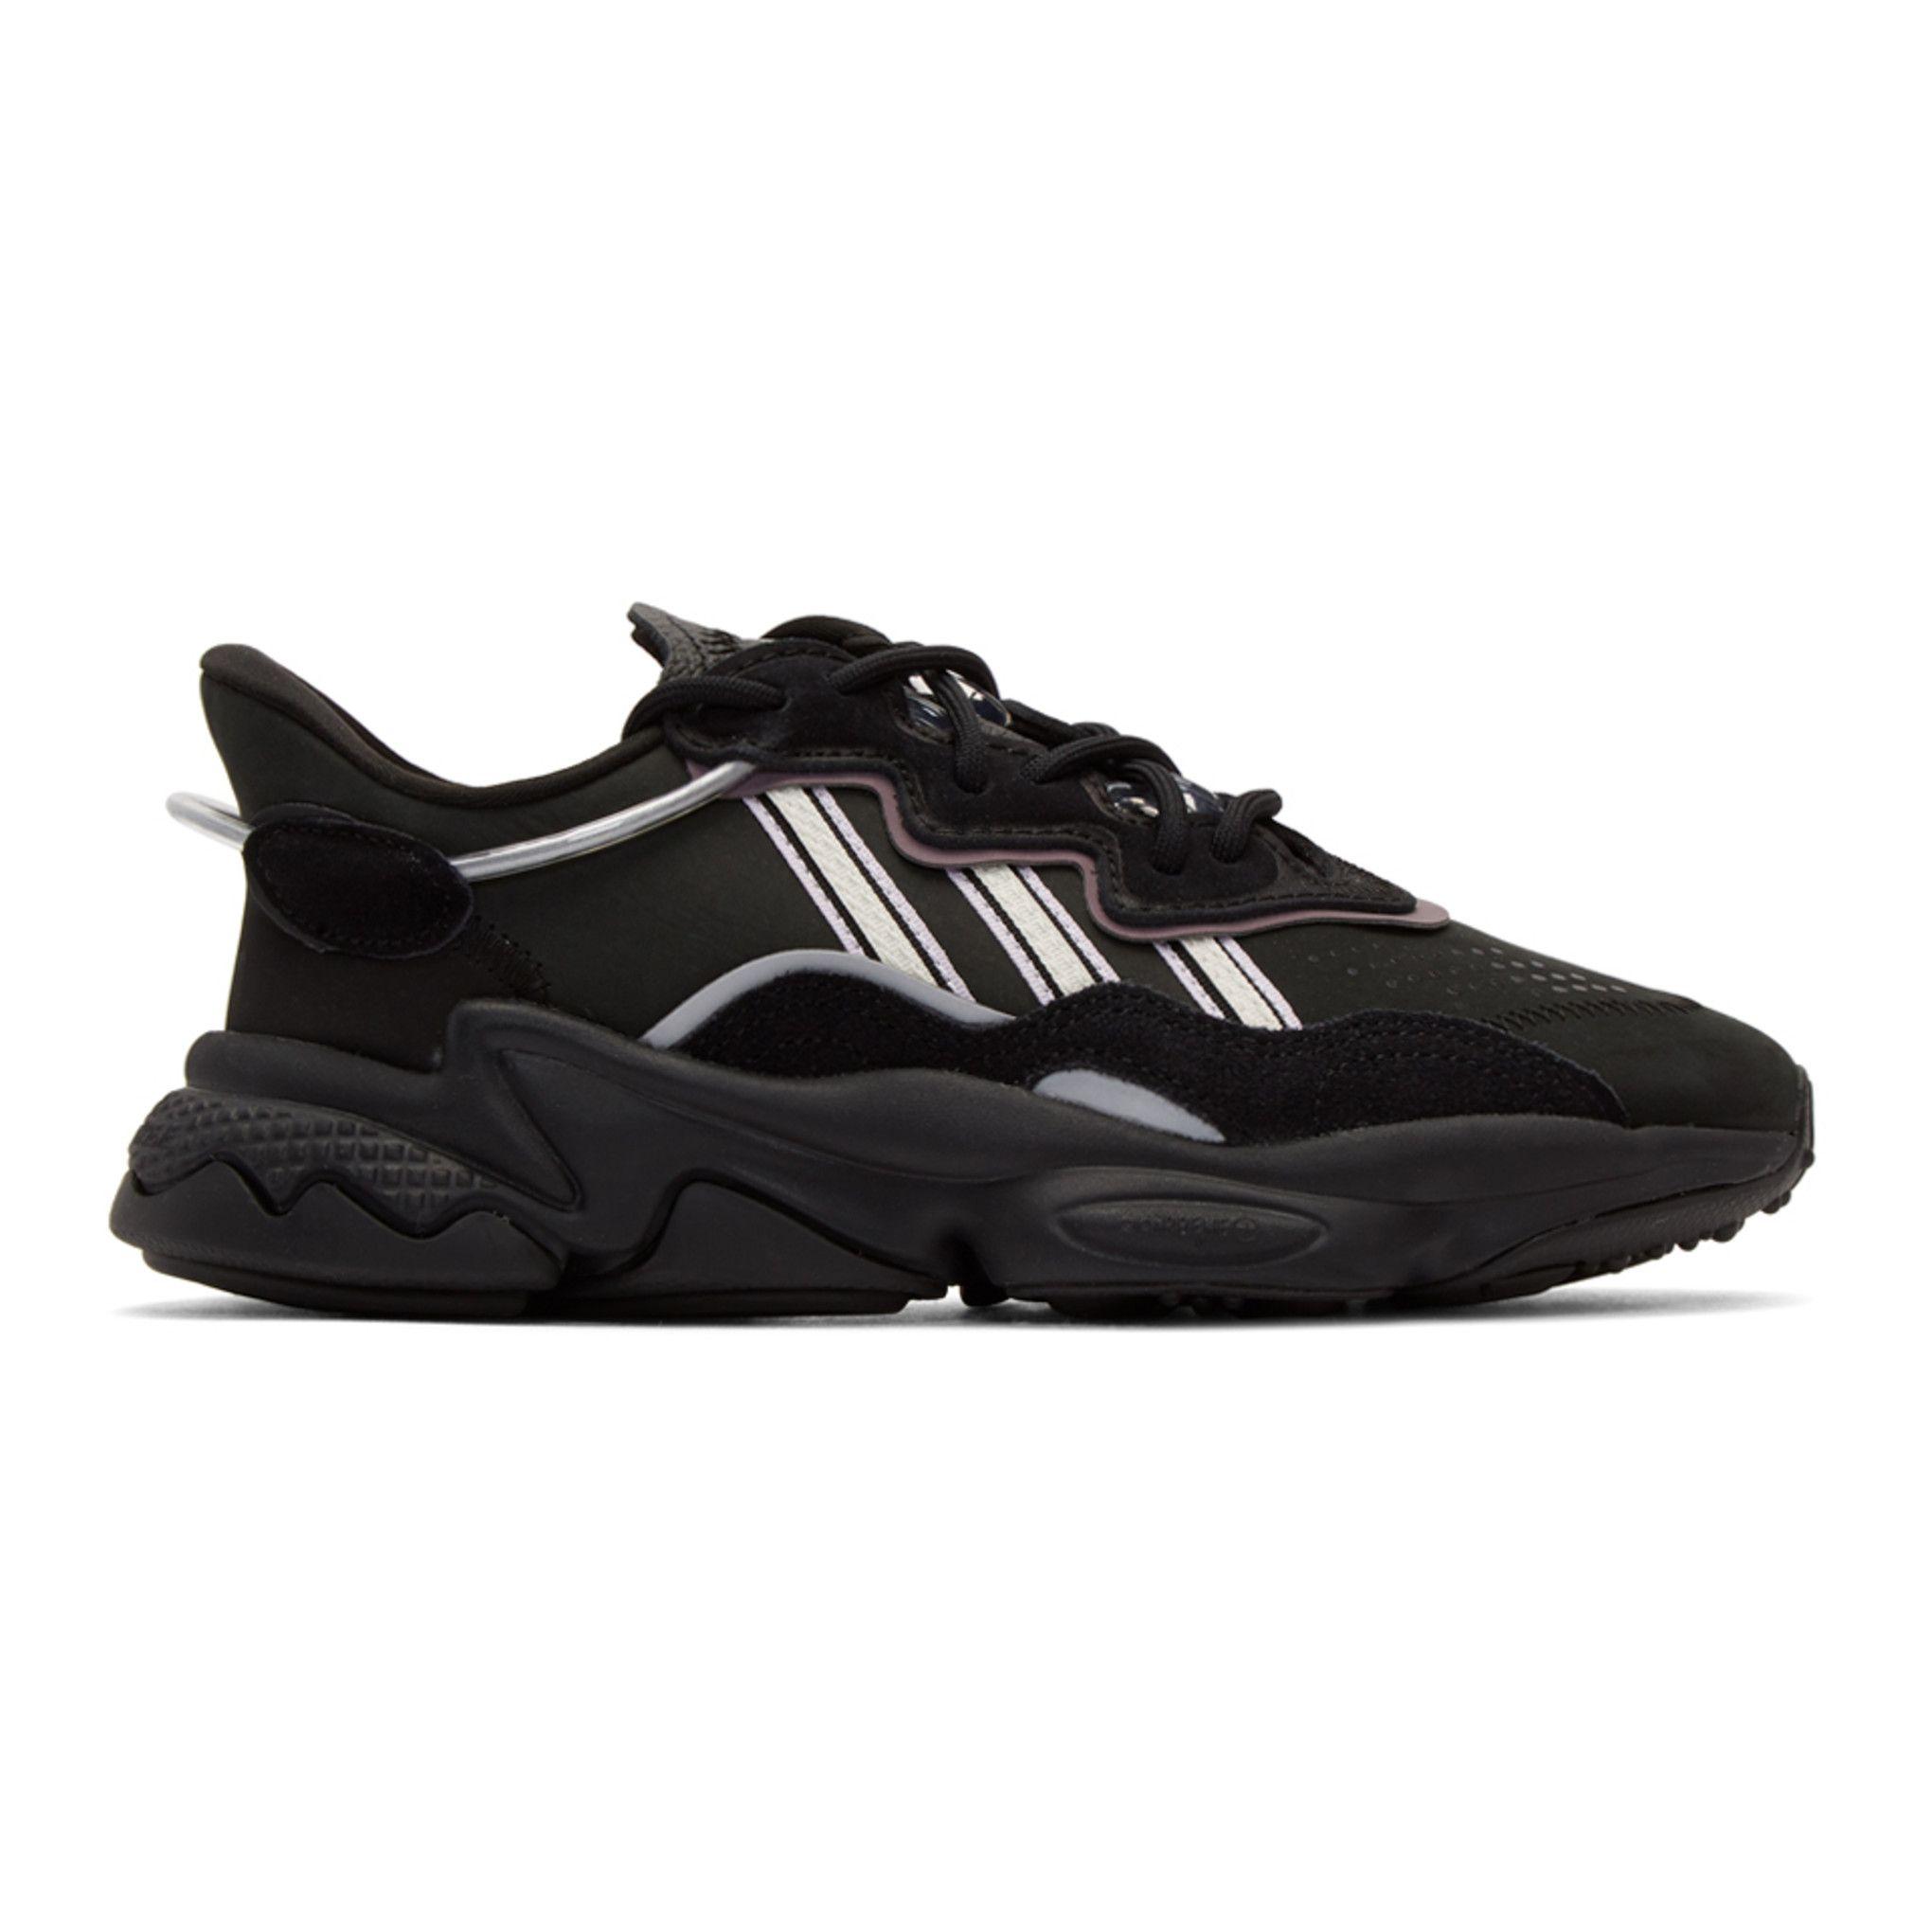 adidas Originals: Black Ozweego Sneakers   SSENSE in 2020 ...